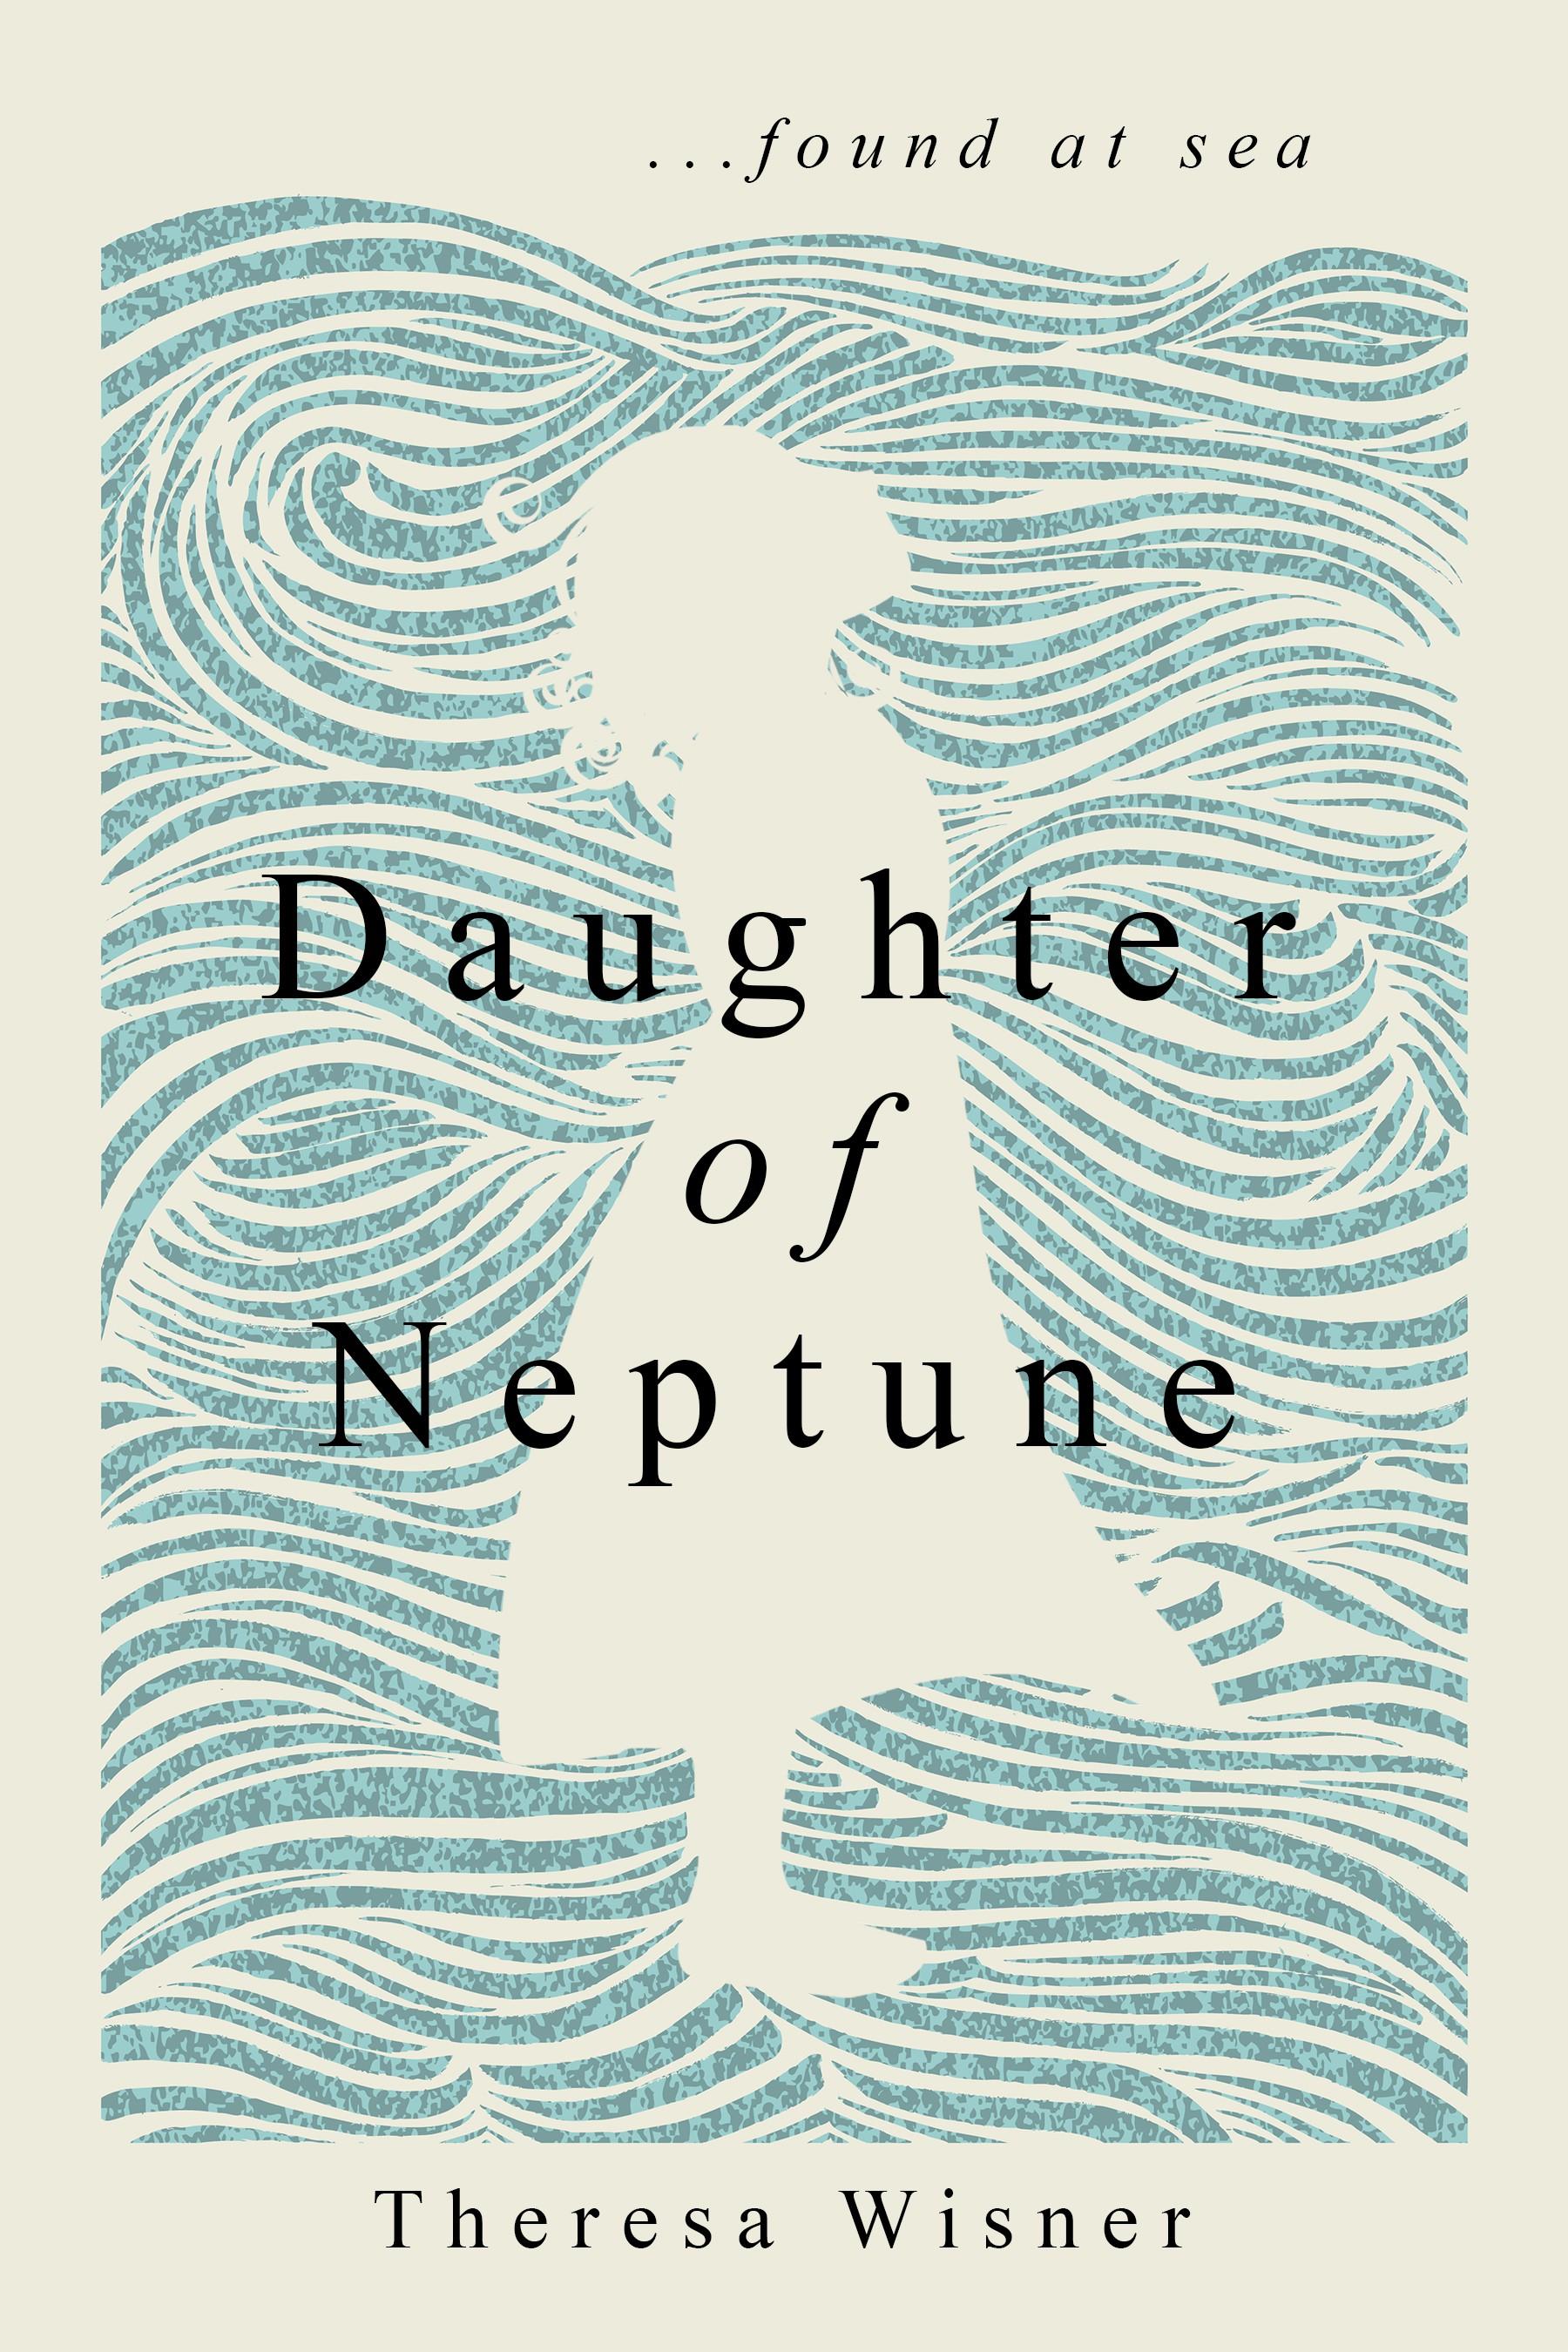 Design a cover for a memoir of the sea